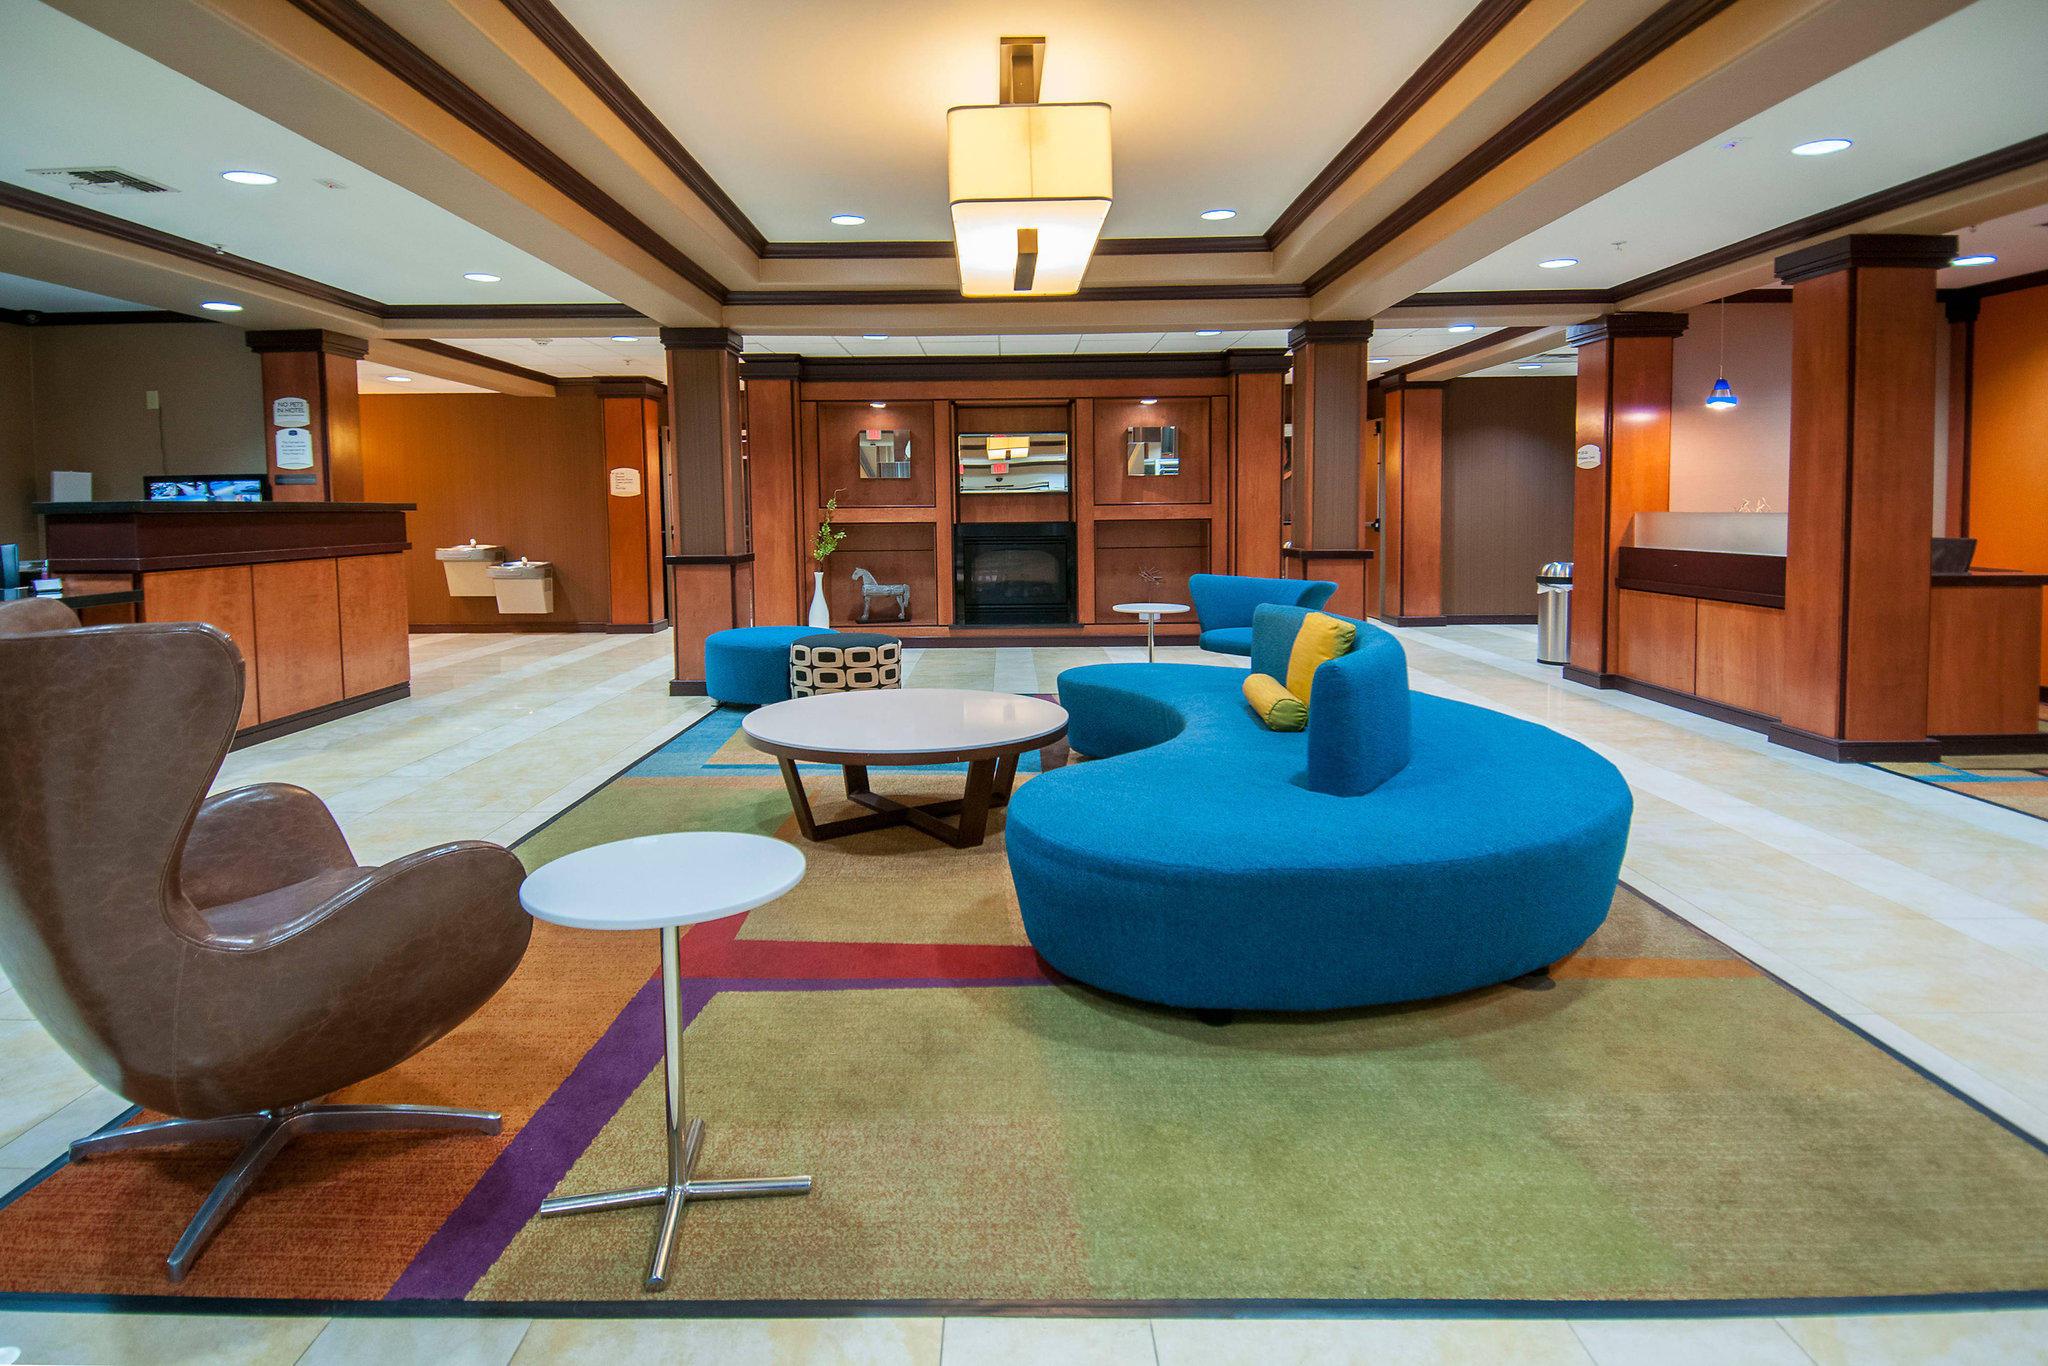 Fairfield Inn & Suites by Marriott San Antonio North/Stone Oak